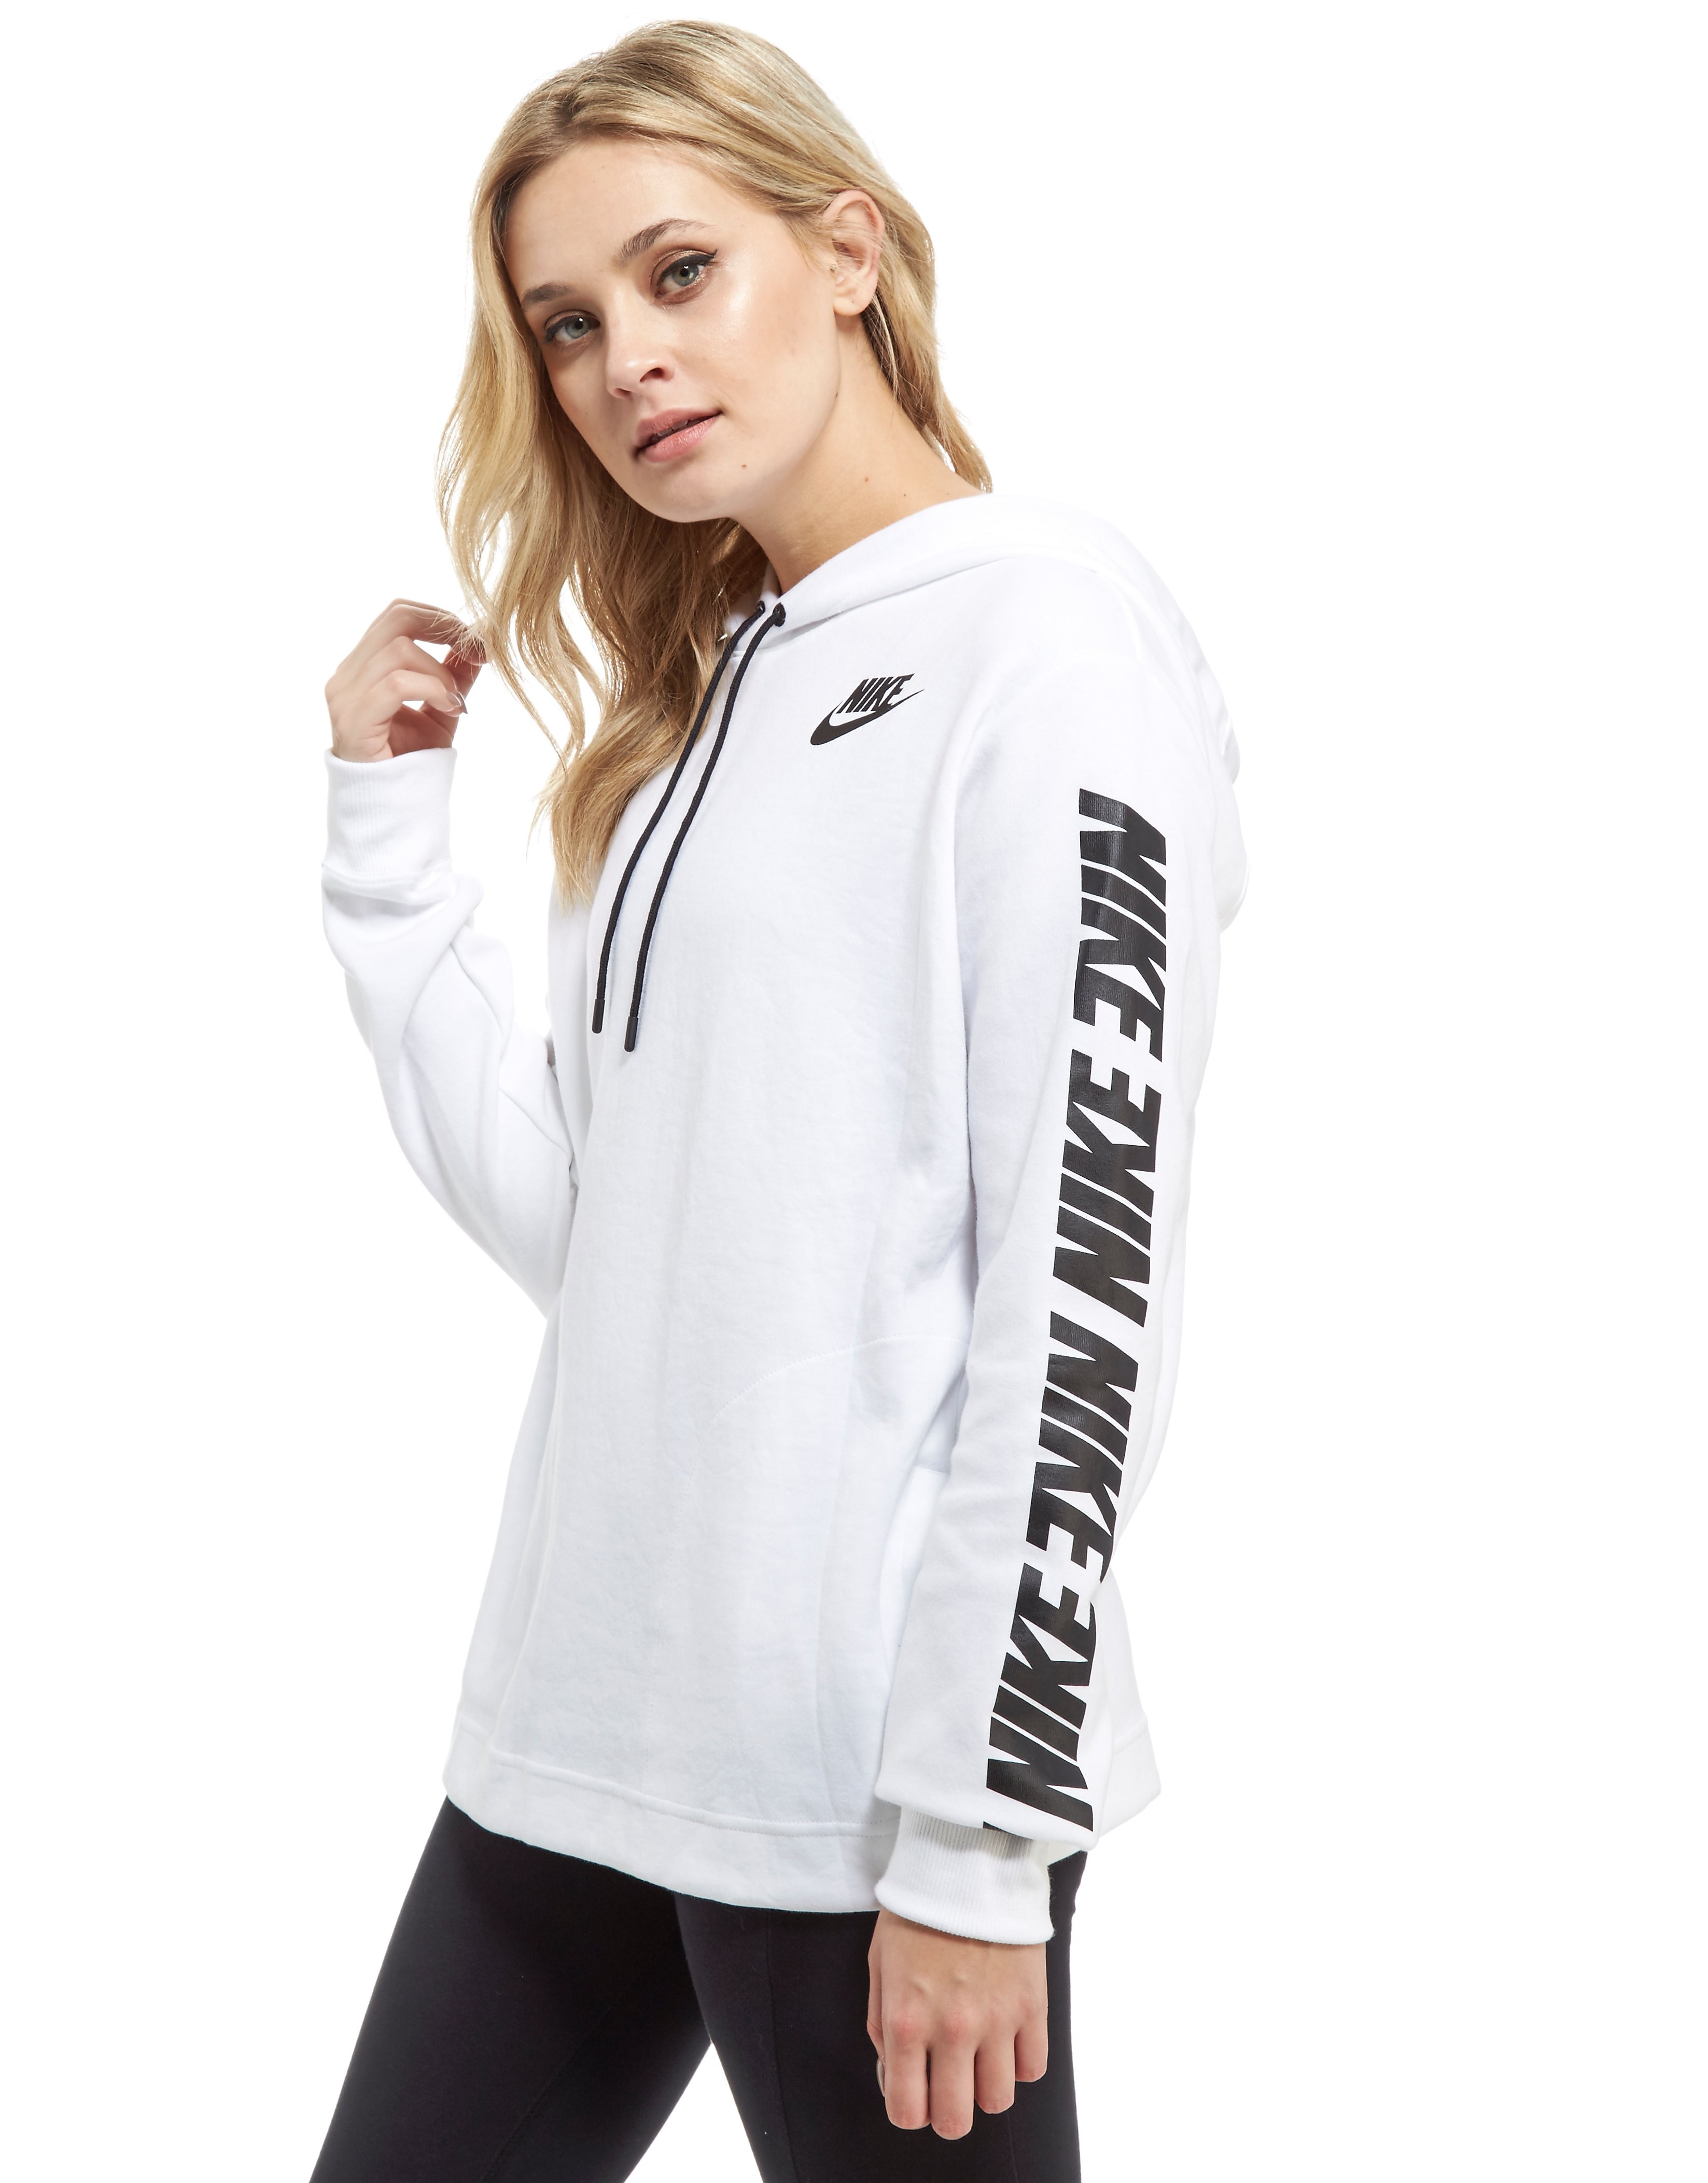 Nike Advance 15 Hoodie